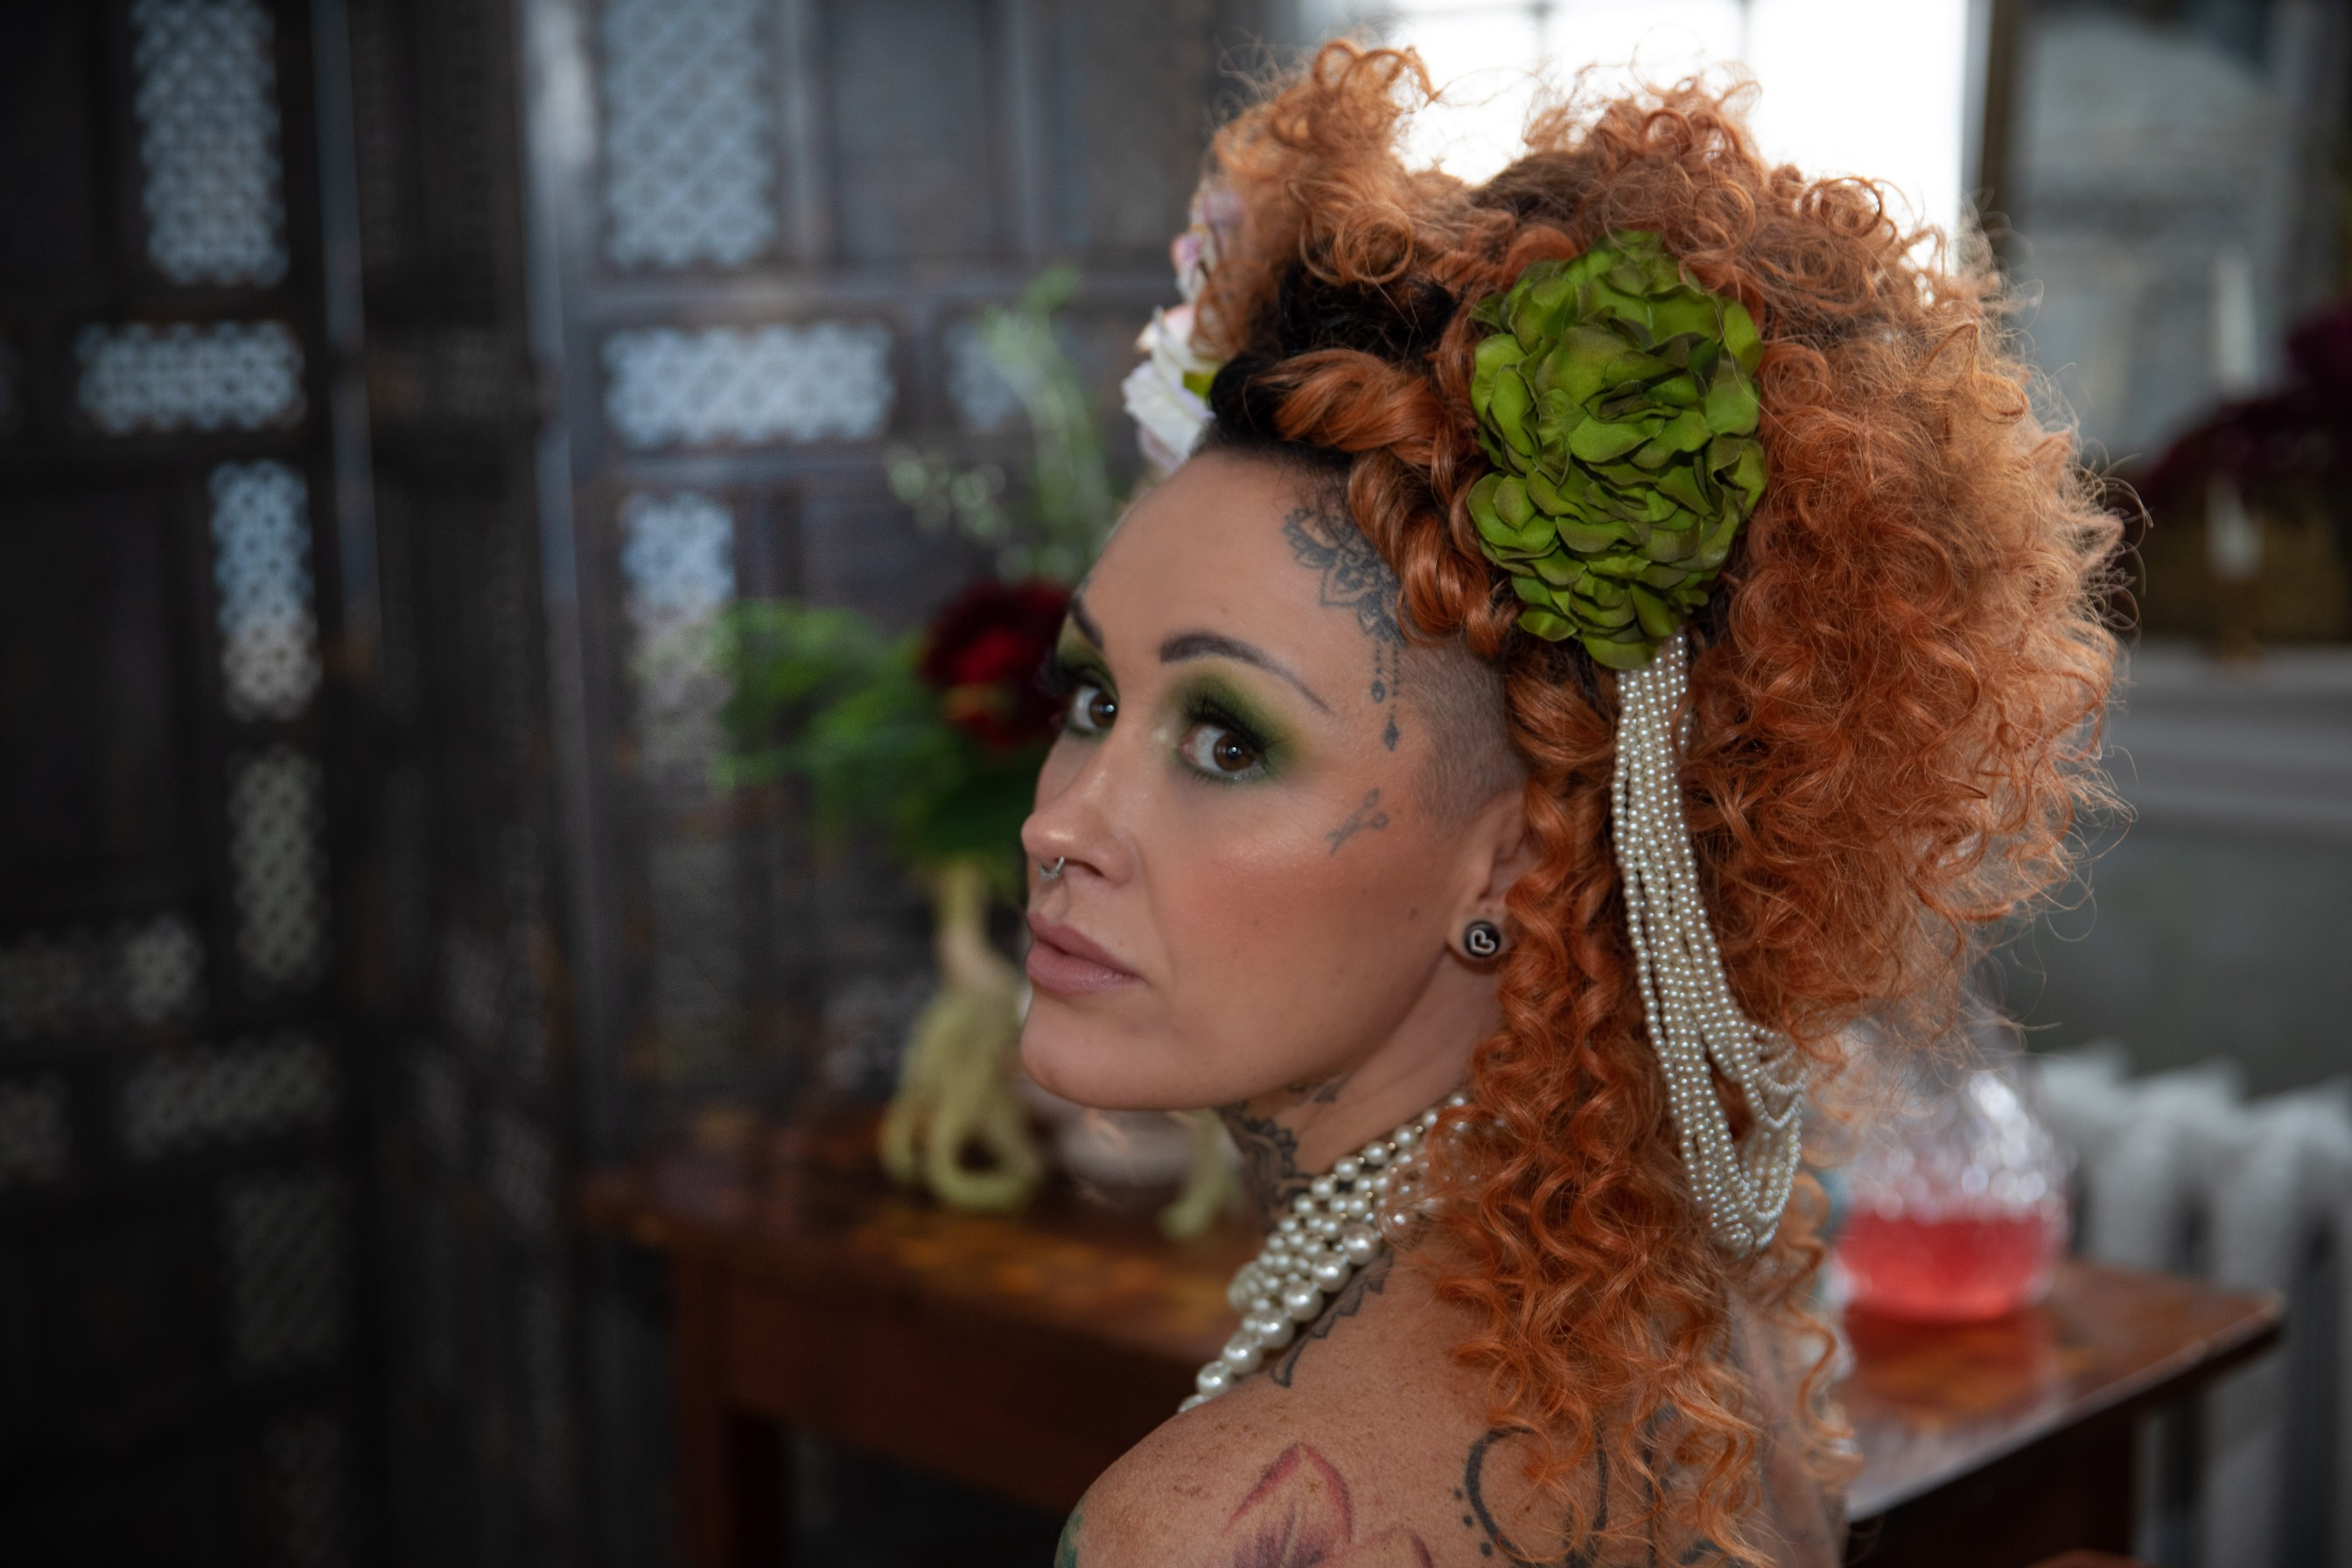 bridgerton wedding - regency wedding - themed wedding - unique bridal hair - alternative bridal look - vintage wedding accessories